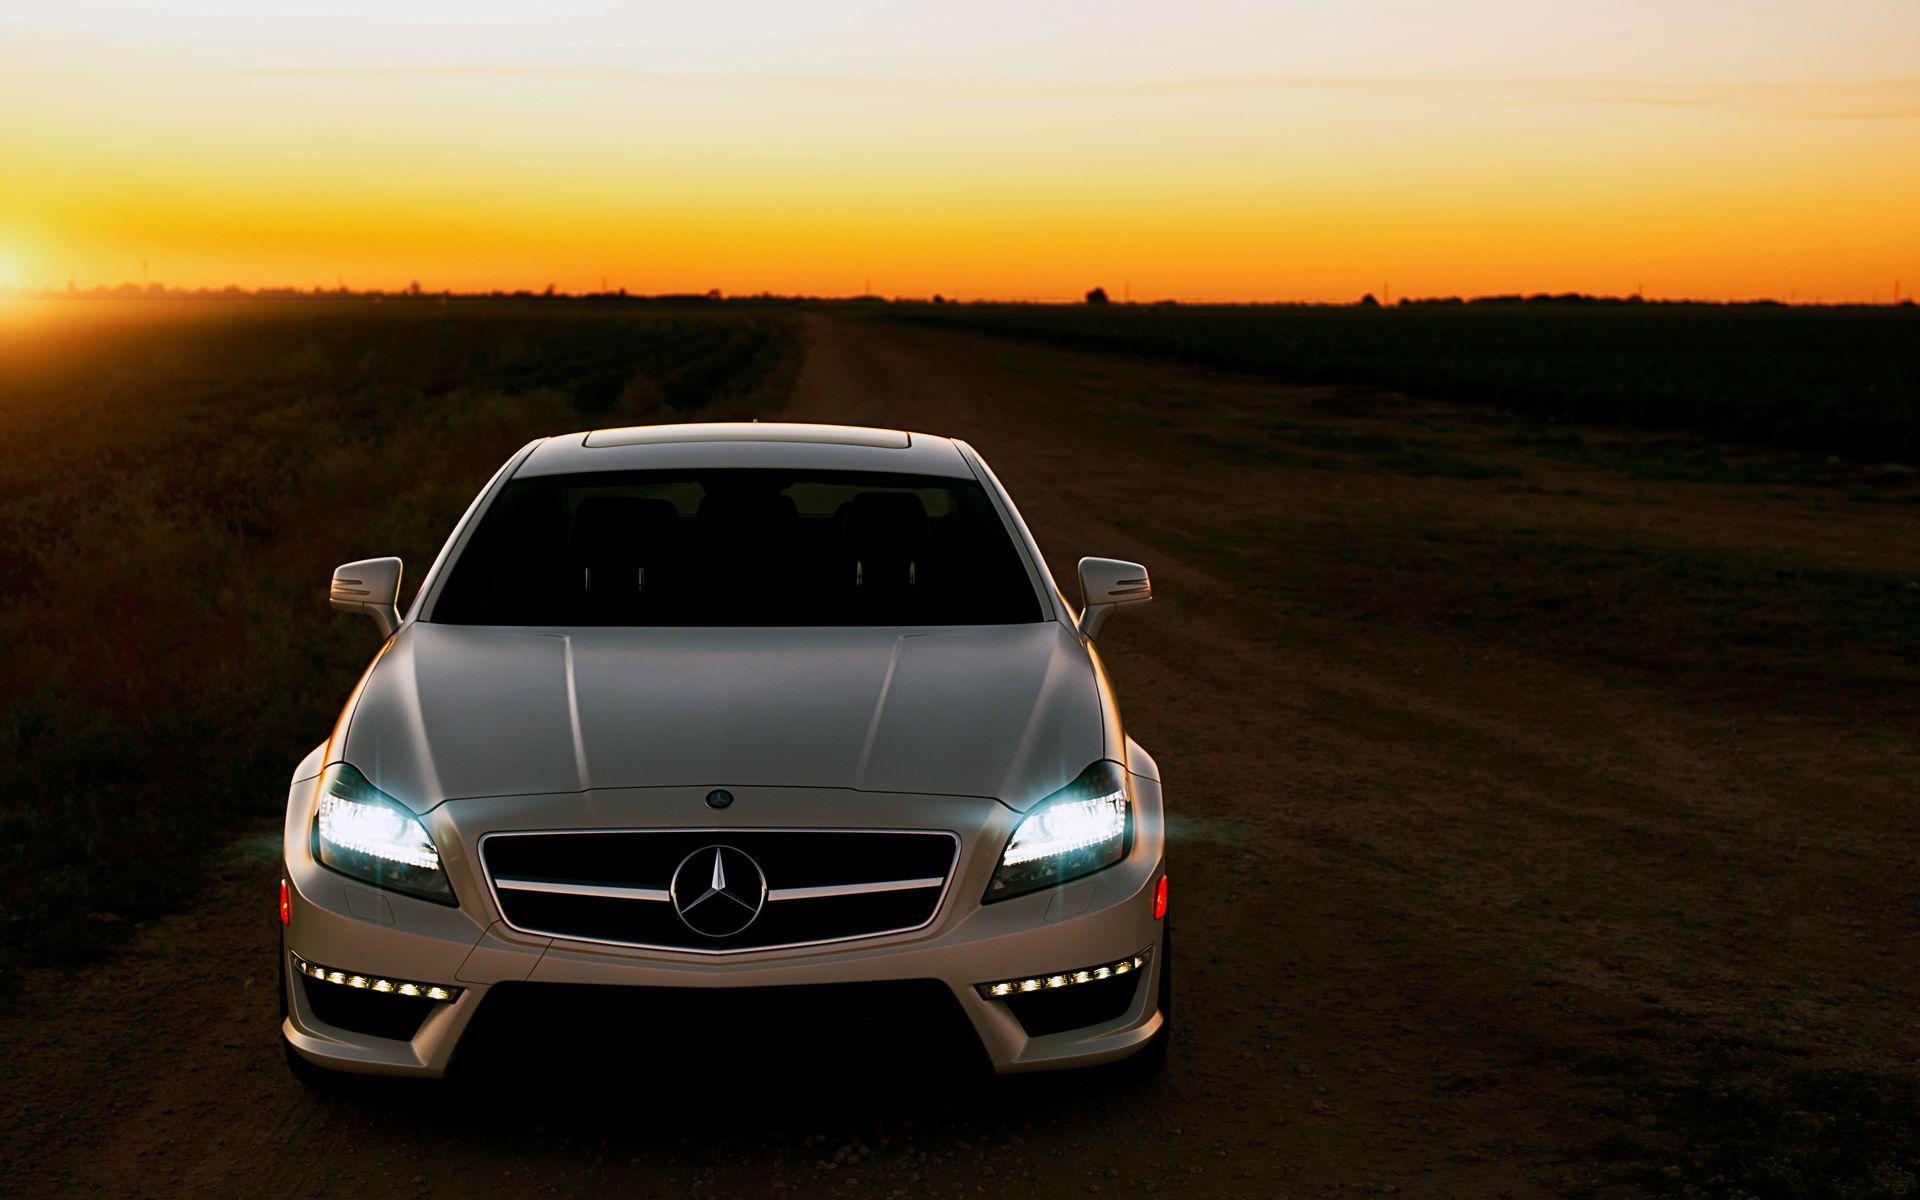 2012 mercedes benz c63 amg car wallpaper wallpaper free download - White Mercedes Benz Cls 63 Amg